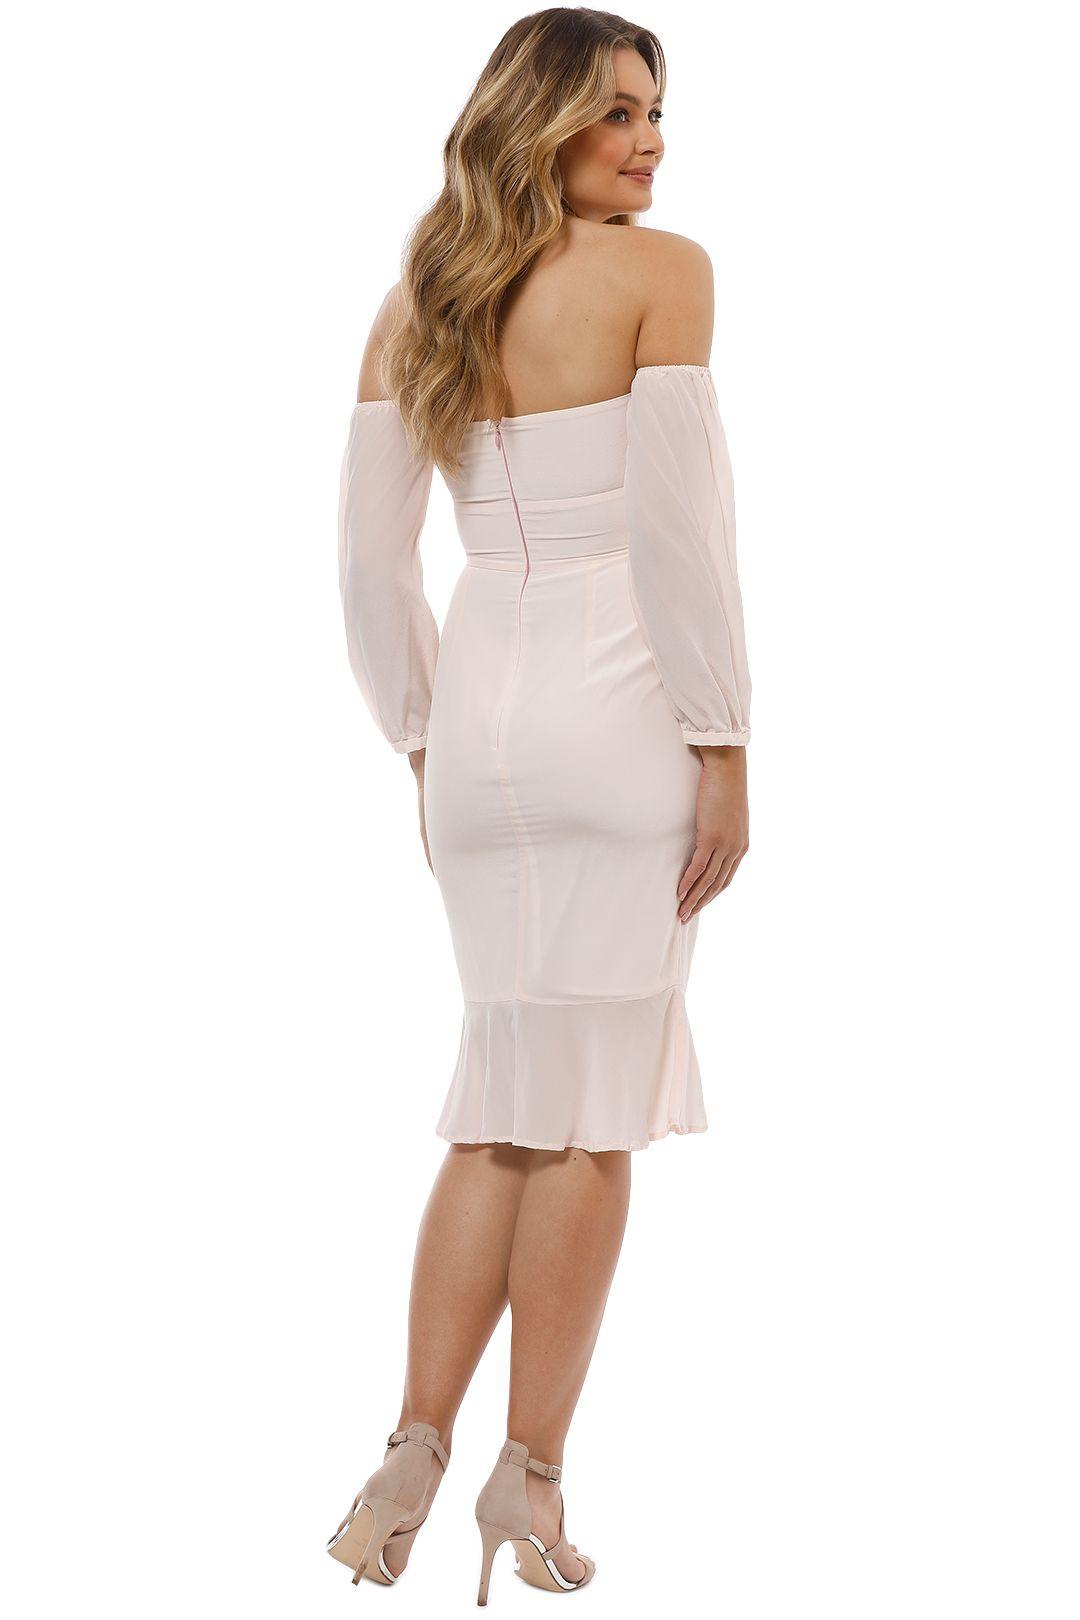 Maison Vivienne - Waltz for a Night Midi Dress - Blush - Back